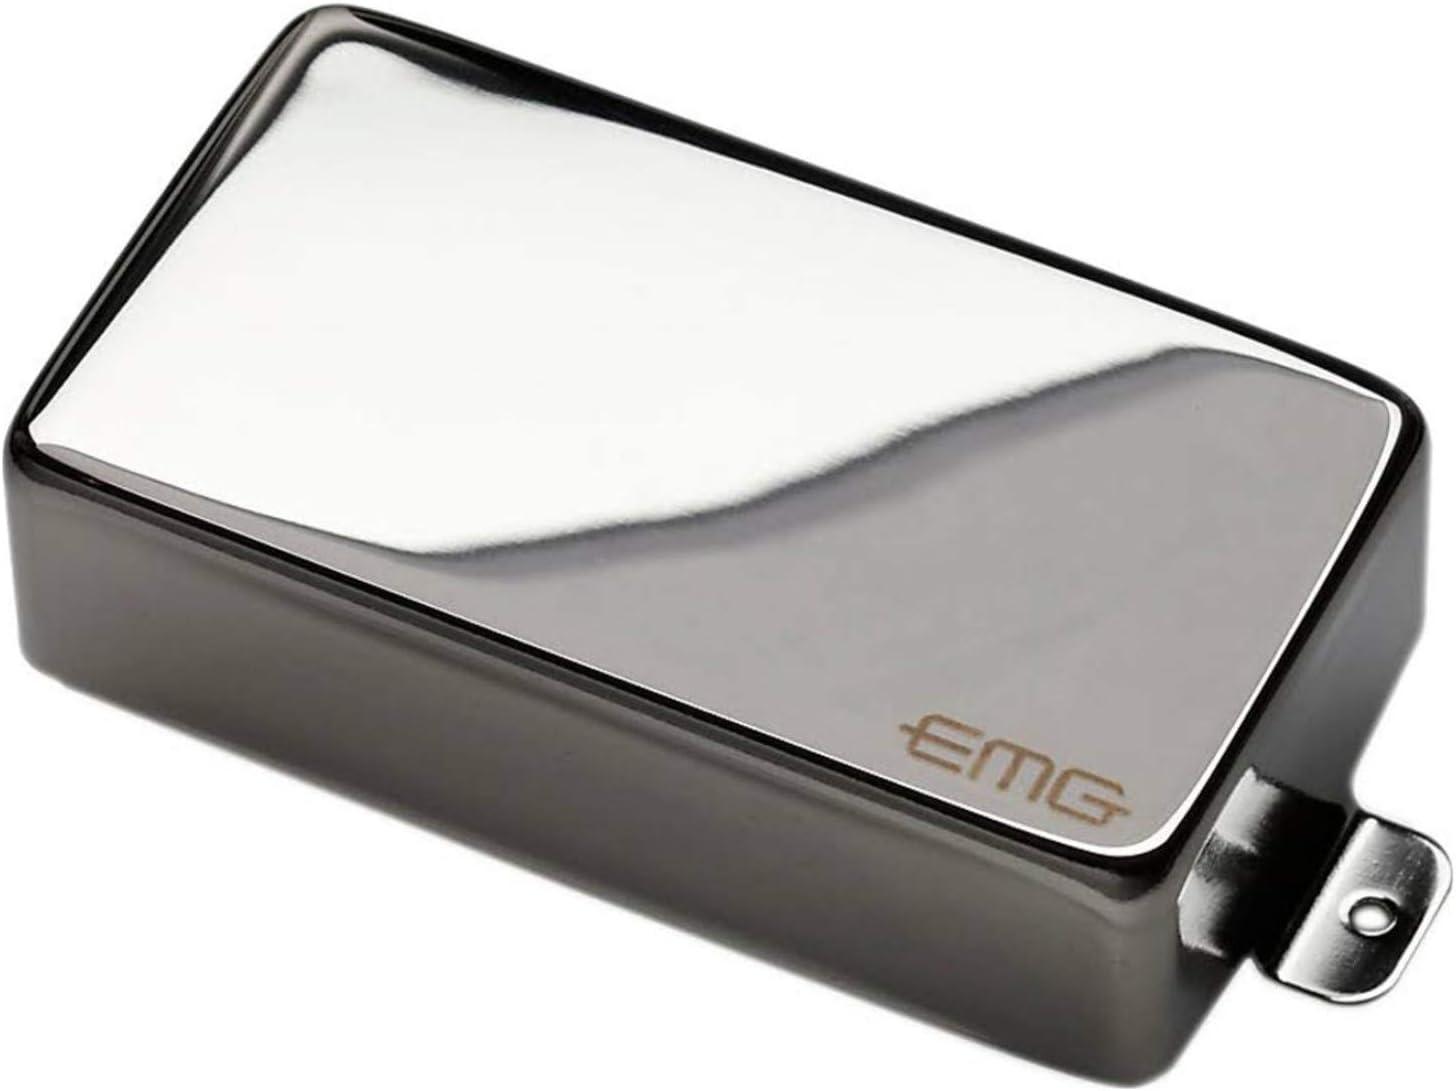 EMG 60 Active Humbucker Guitar Pickup Black